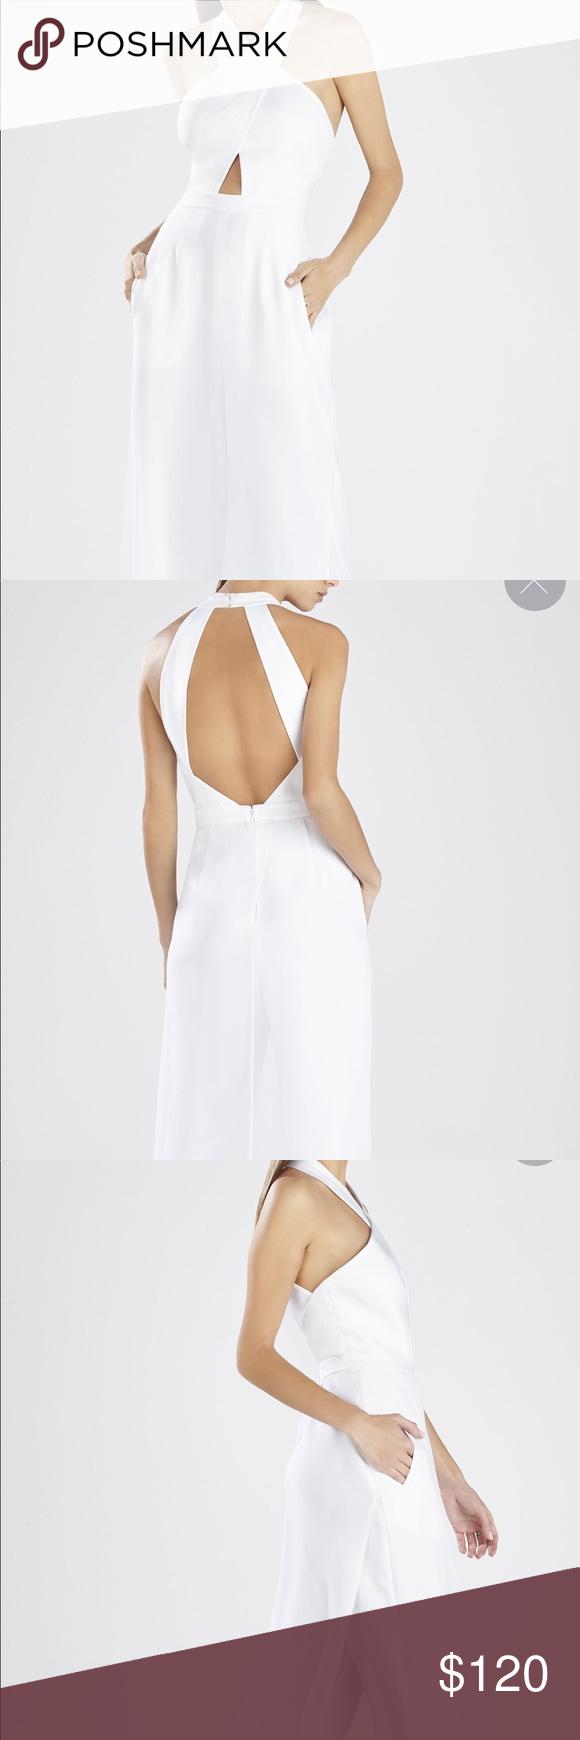 f4cd1b7dd7e6 Bcbg maxazria josselyn halter top white jumpsuit